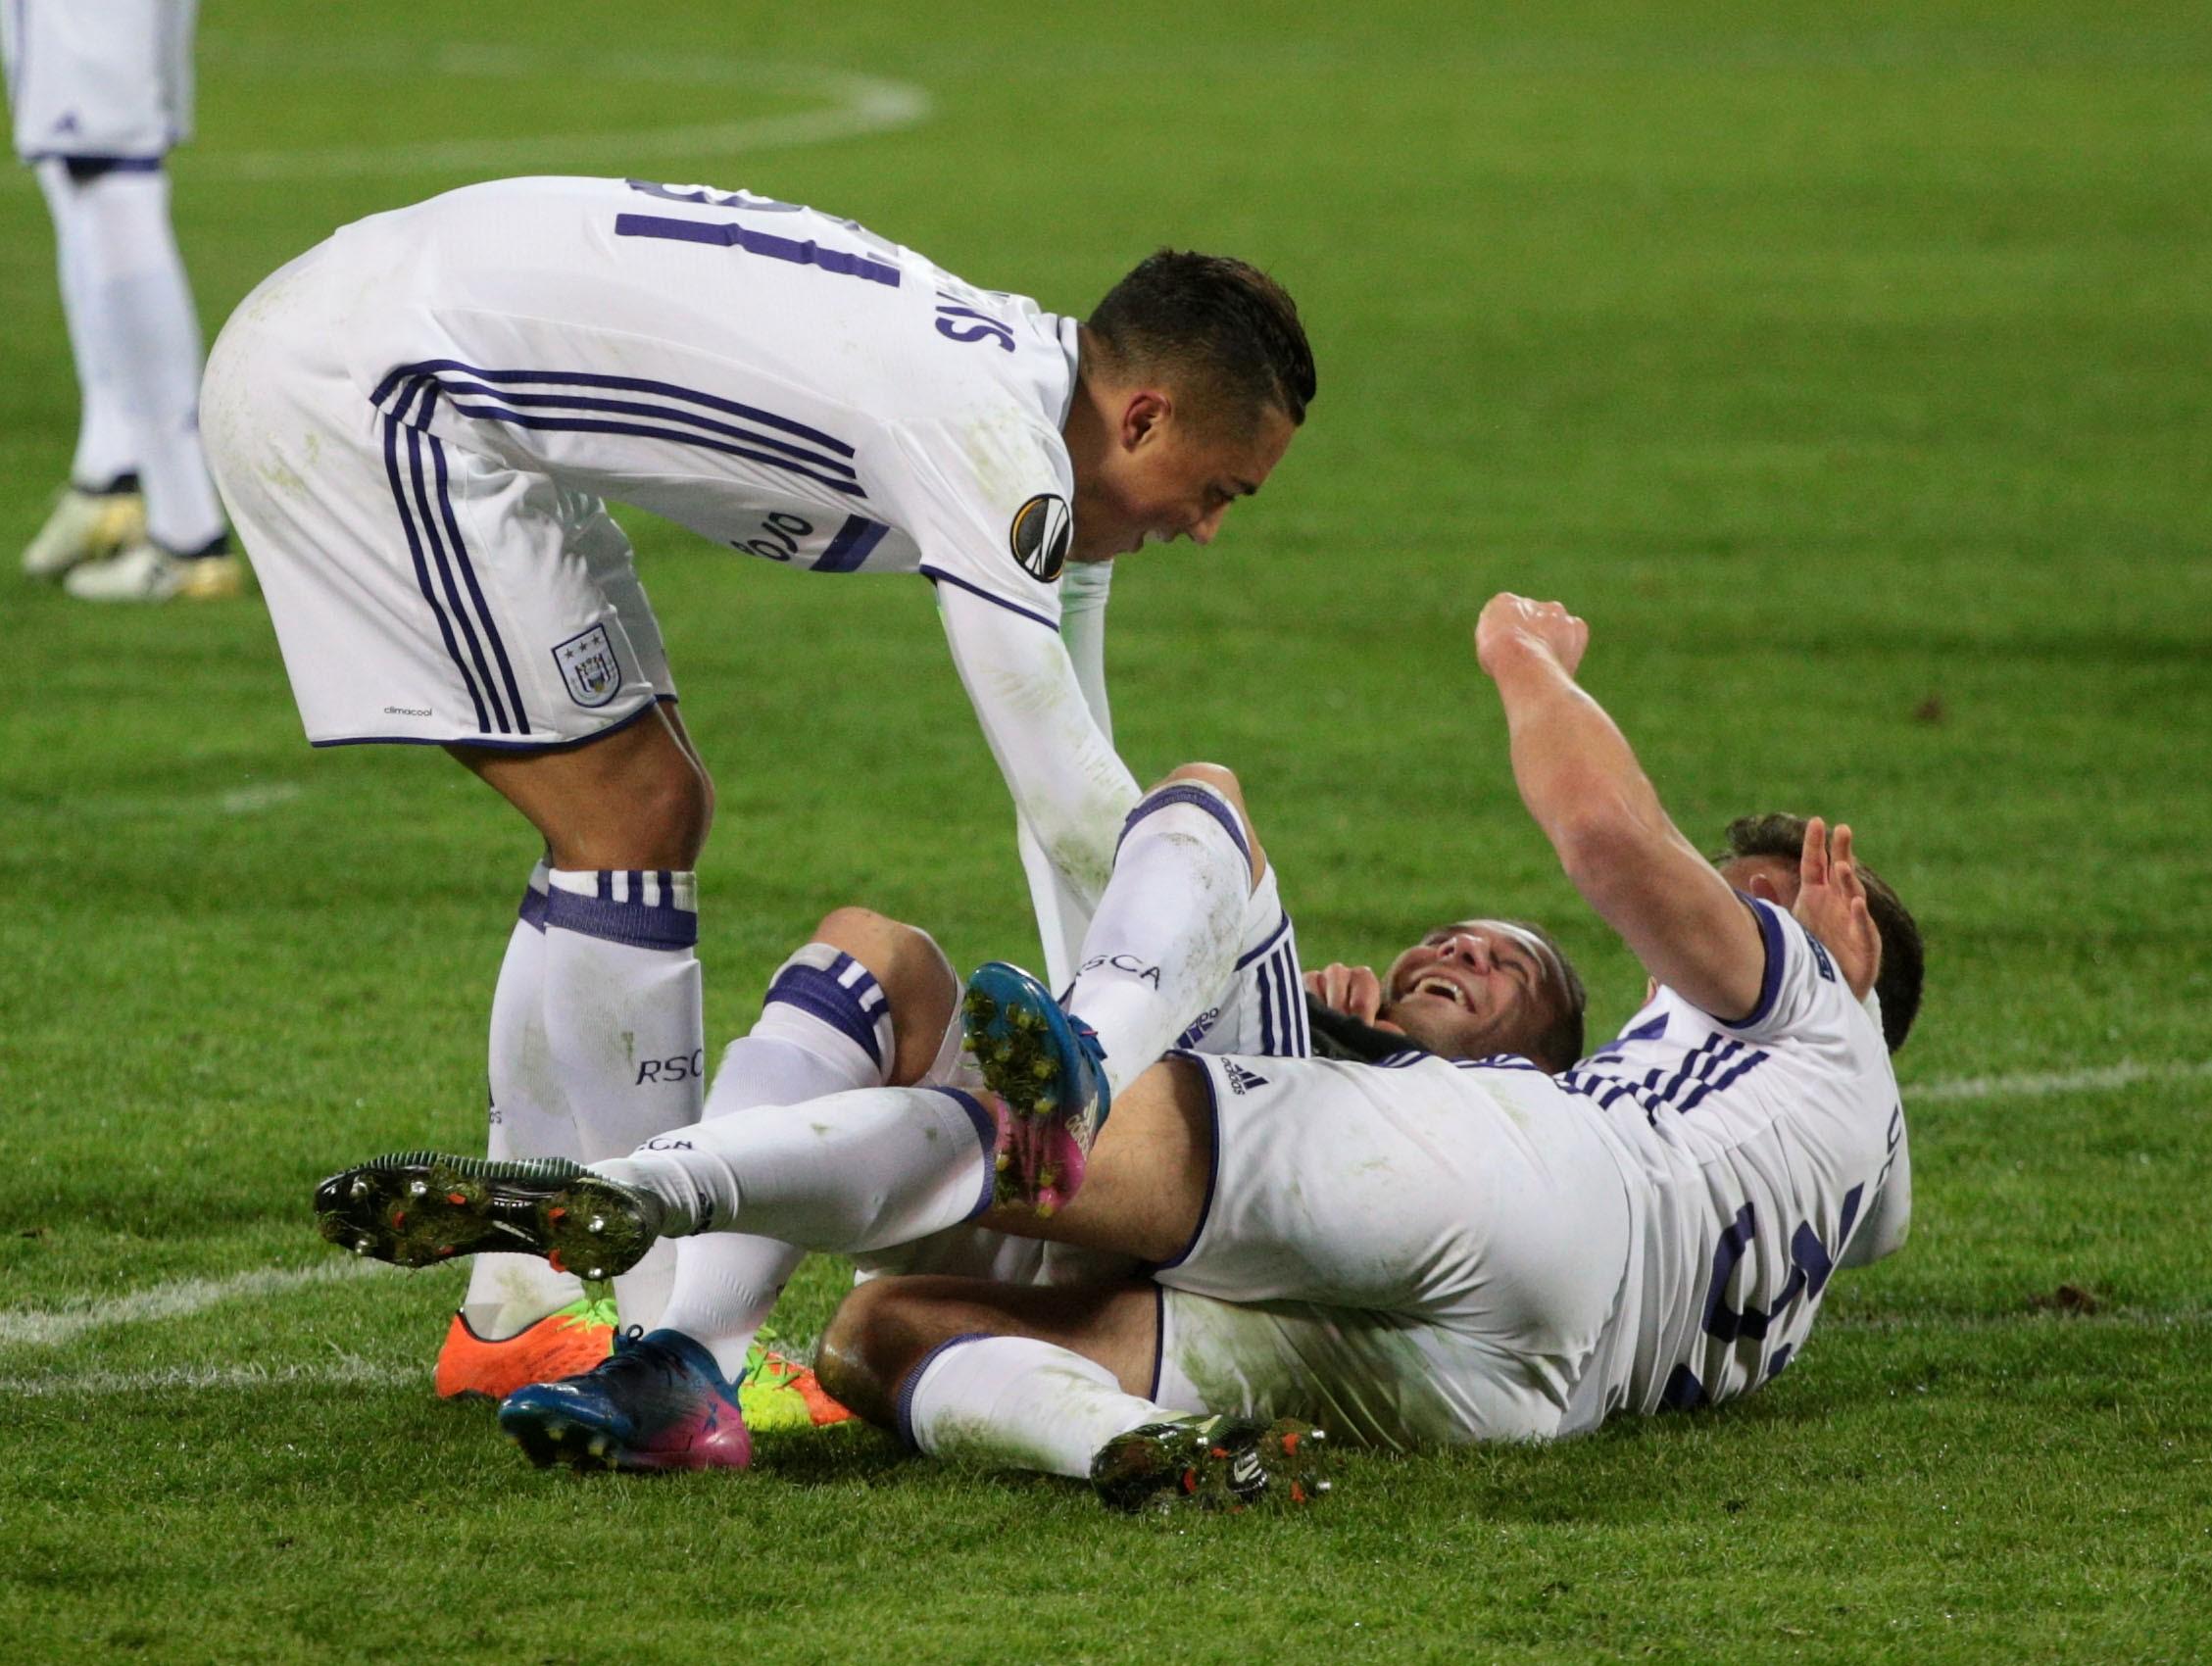 Anderlecht vs Zulte Waregem: el campeón de Liga lleva ventaja en la Supercopa de Bélgica